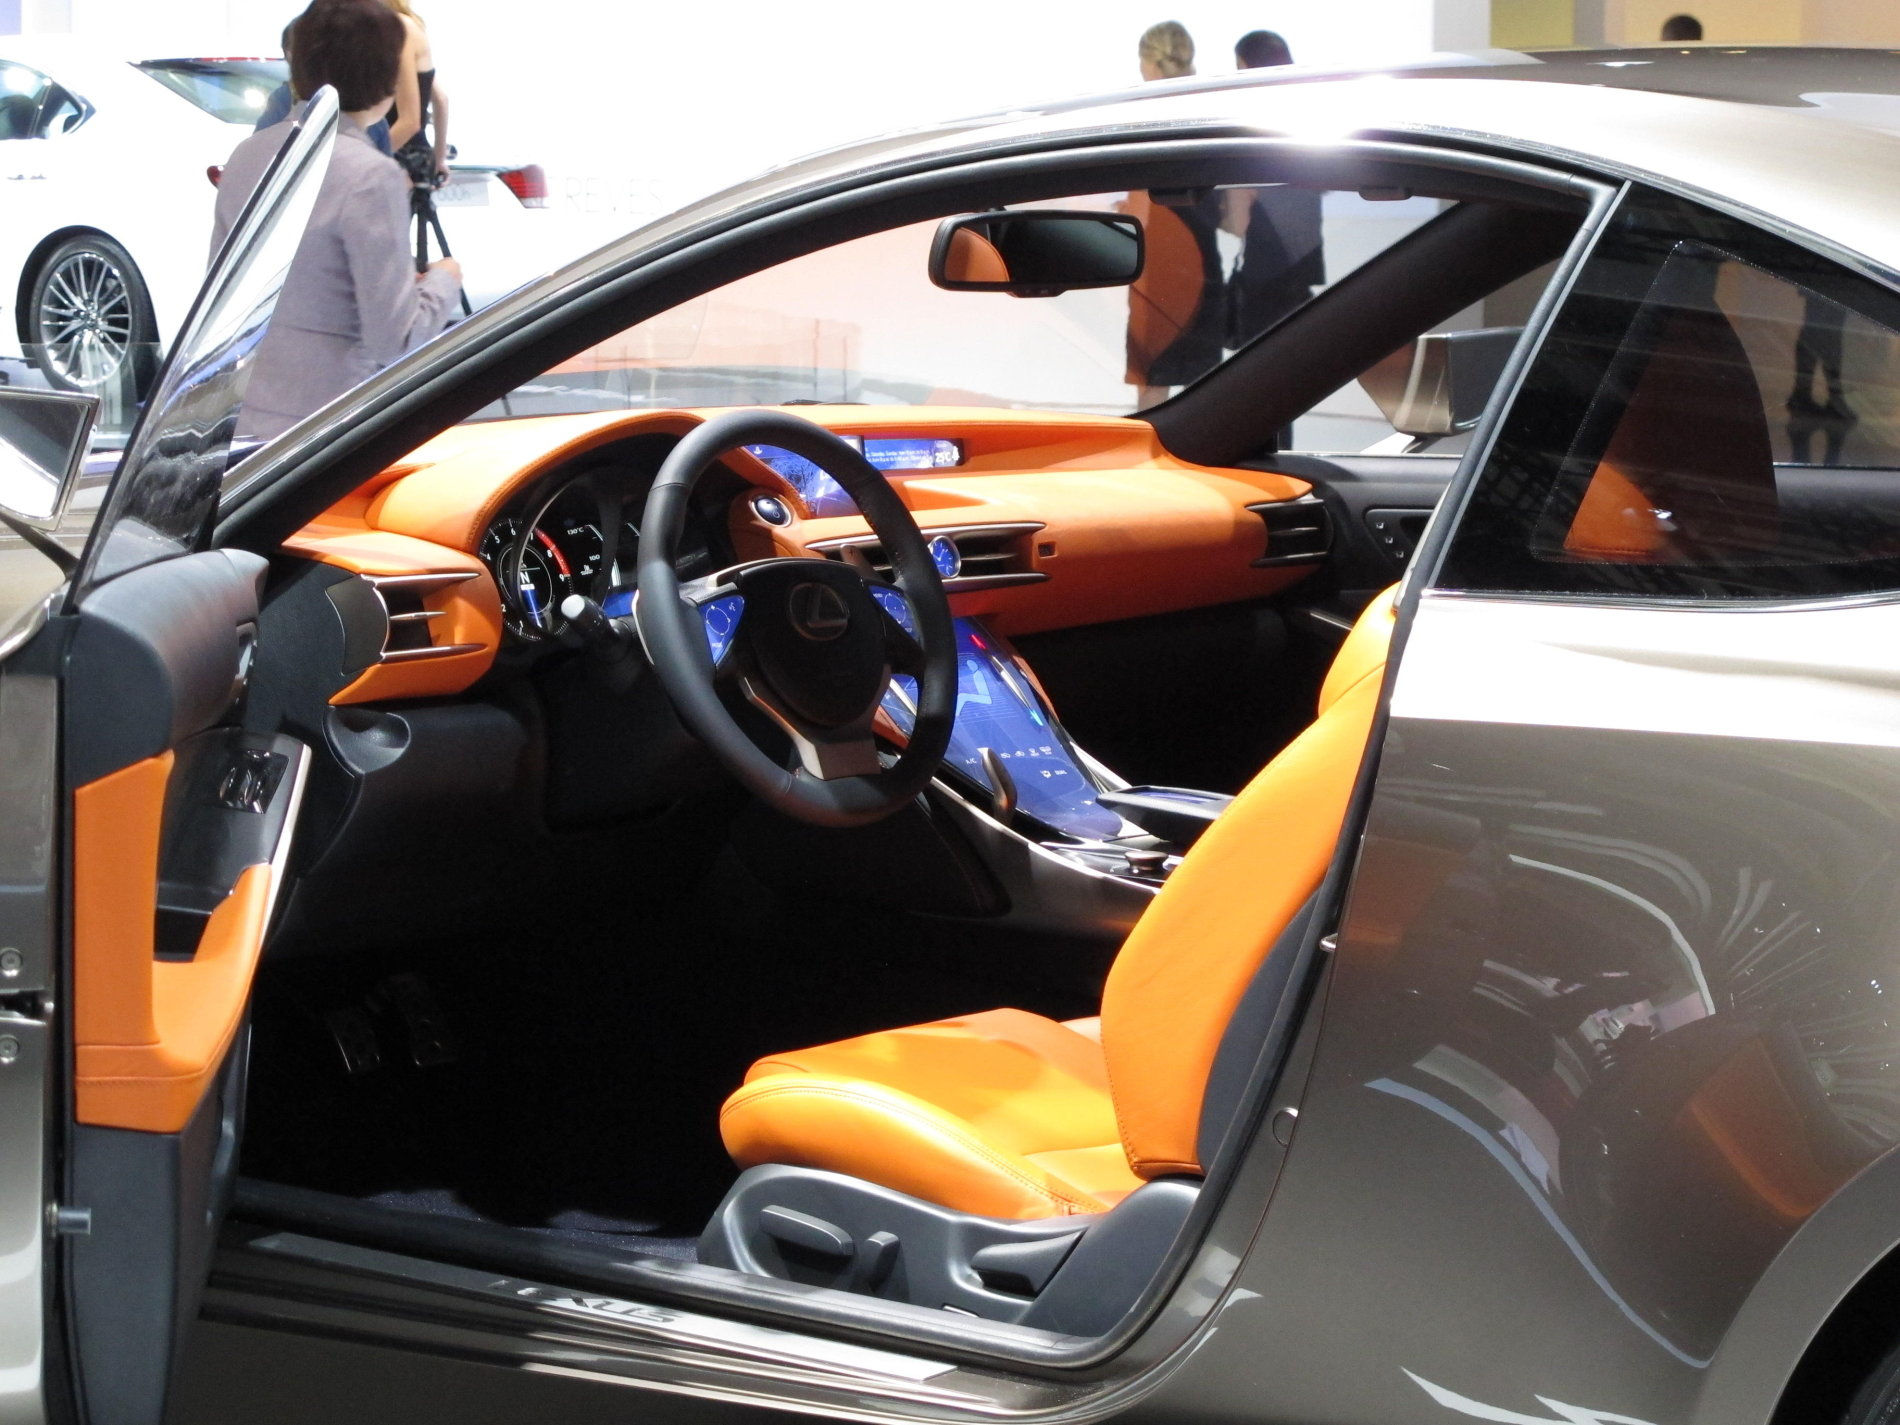 Salonul Auto de la Paris 2012: Lexus LF-CC Concept - Salonul Auto de la Paris 2012: Lexus LF-CC Concept